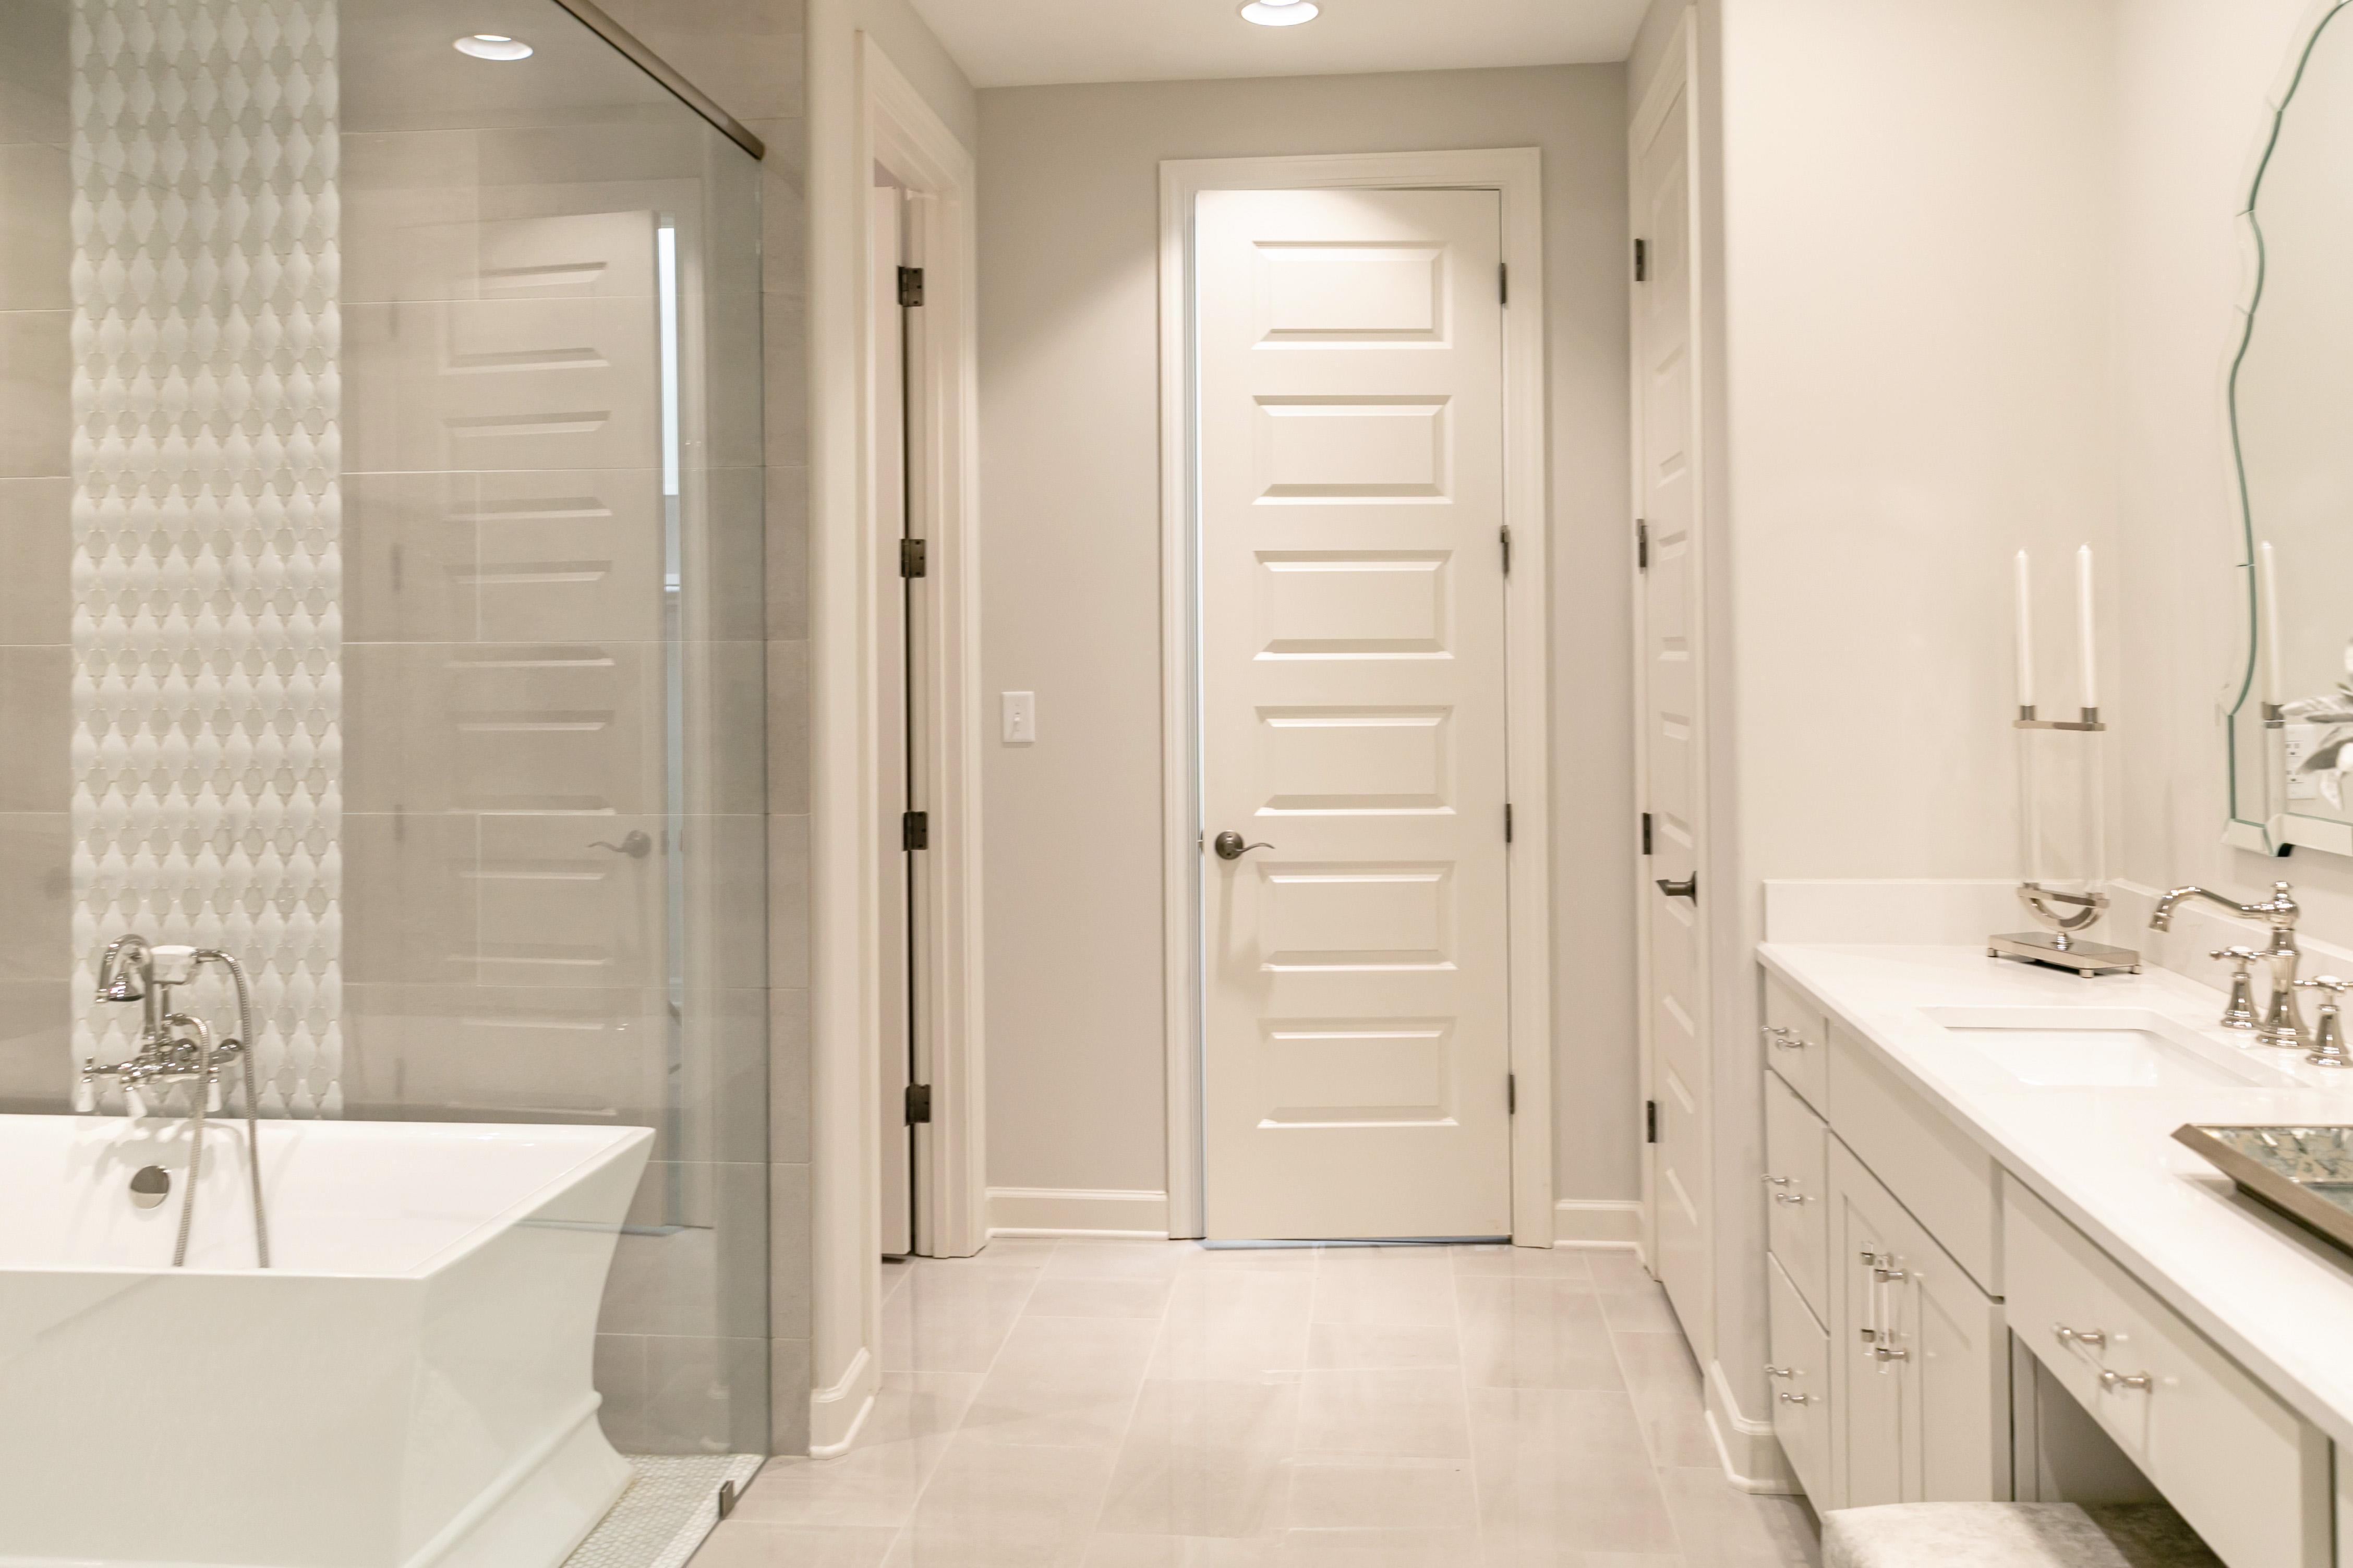 Bathroom featured in the Abbott  By Regency Homebuilders in Memphis, TN